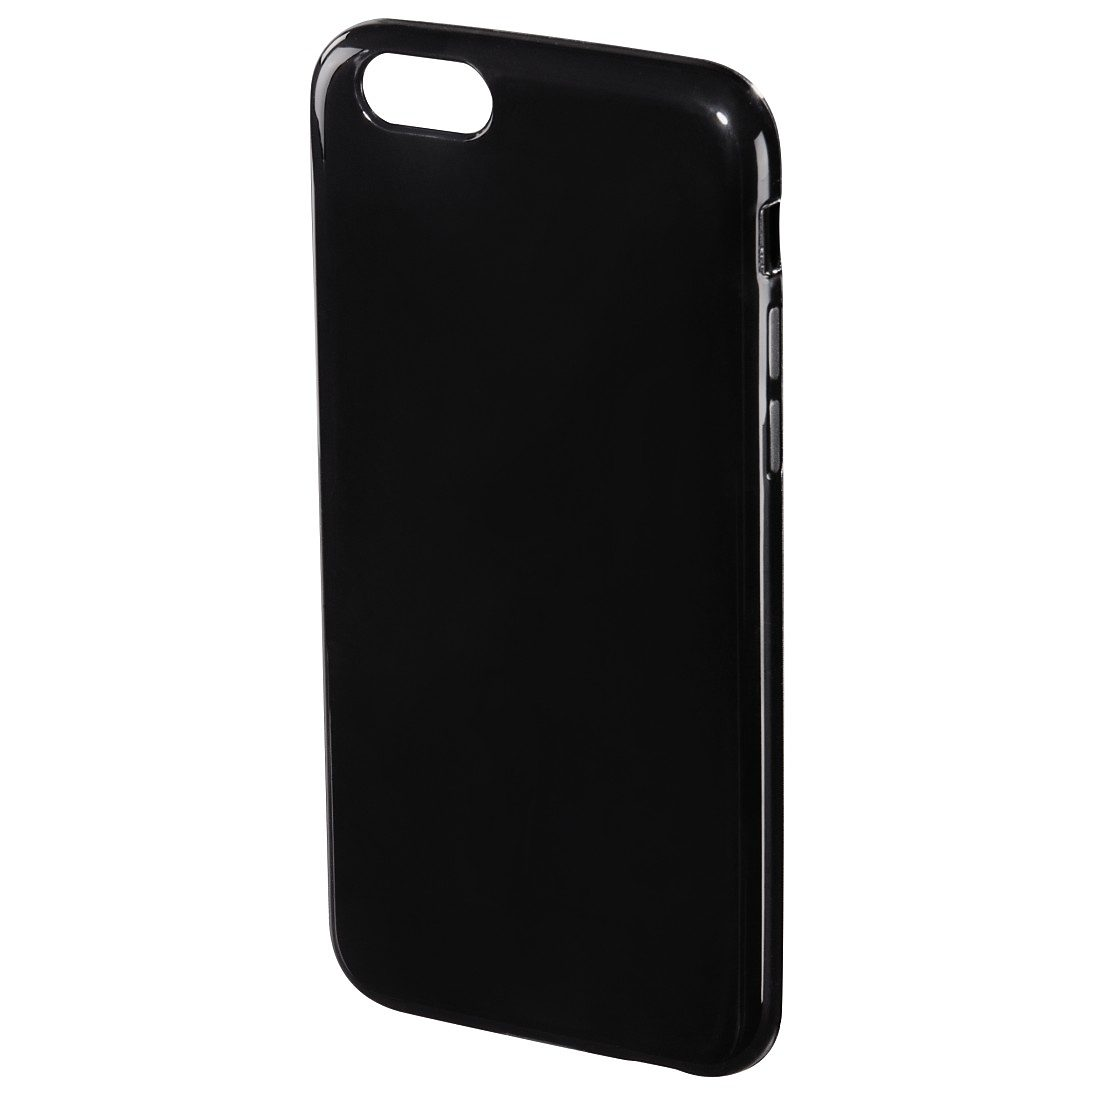 Hama Cover Crystal für Apple iPhone 6/6s, Schwarz